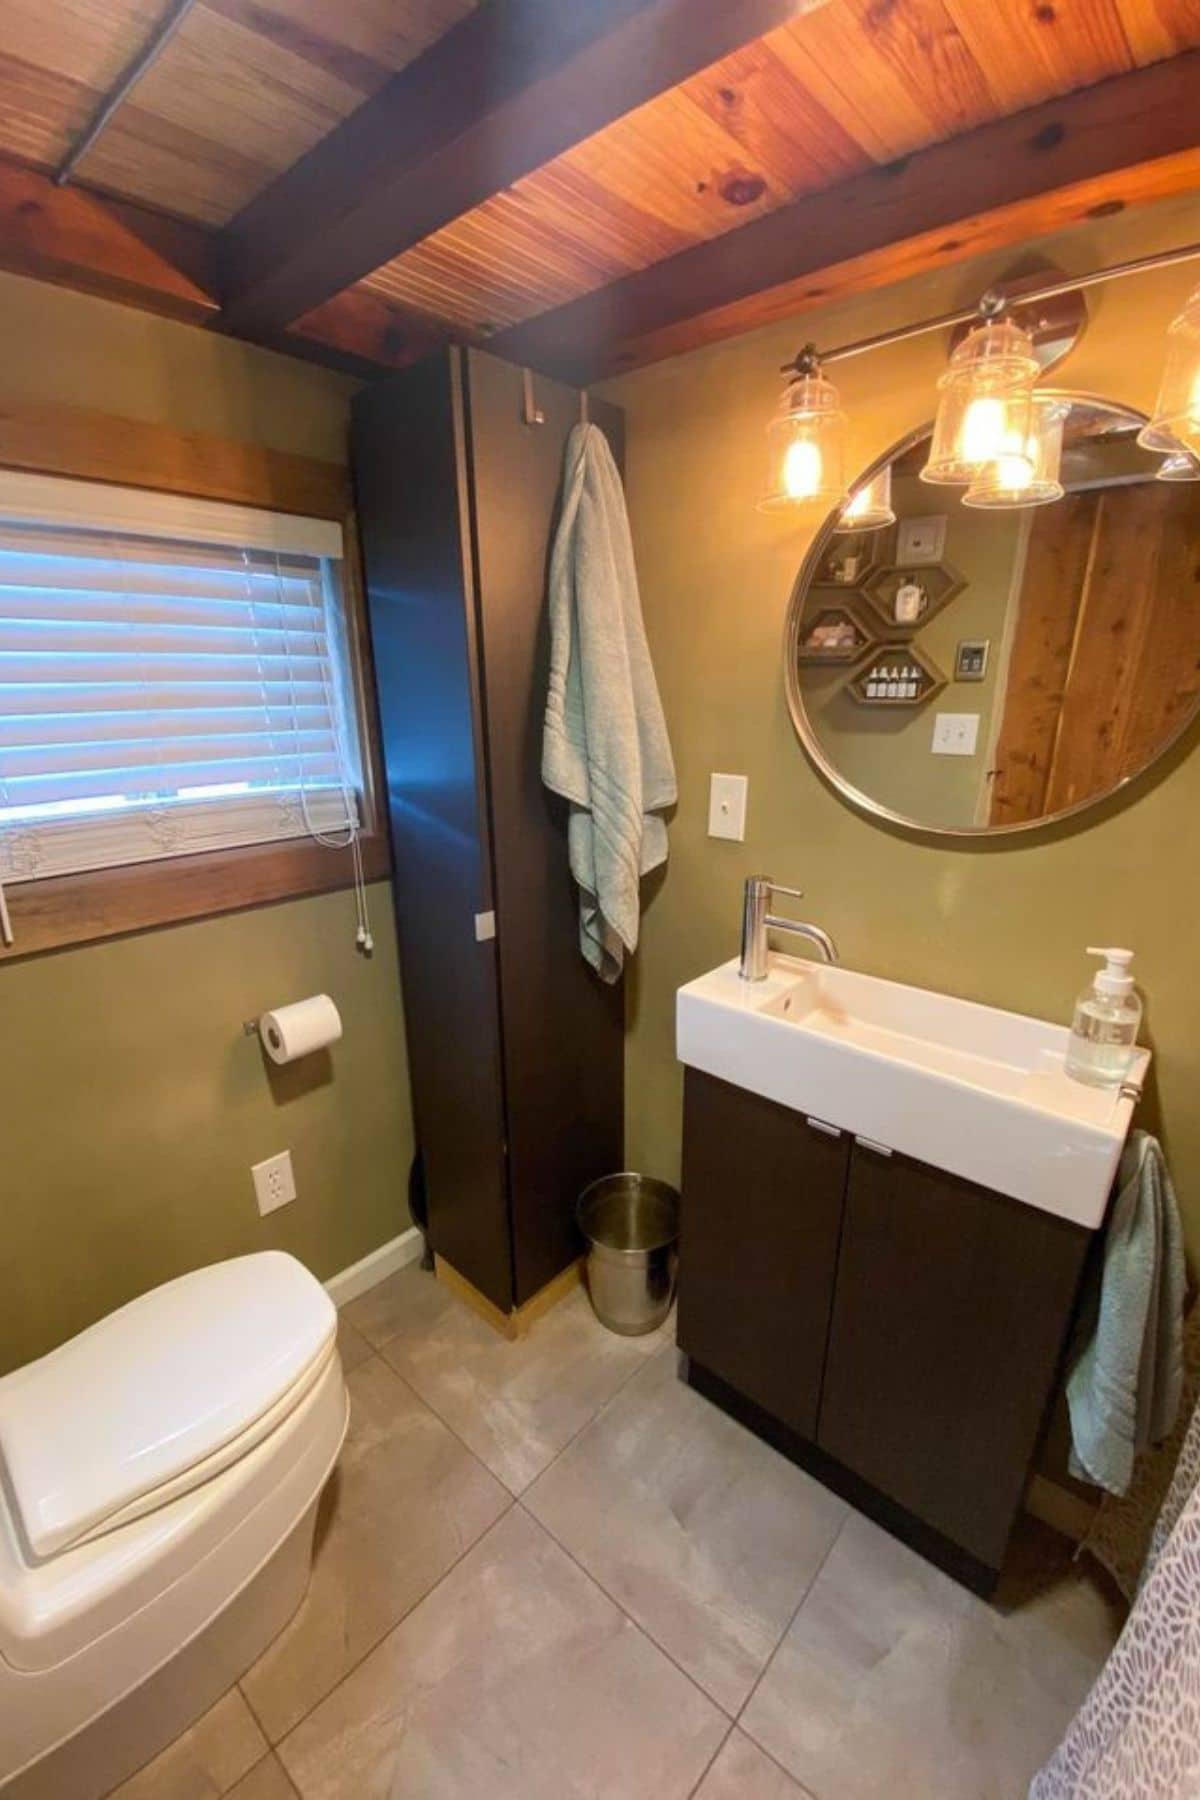 Green walls of bathroom with dark wood vanity and white sink